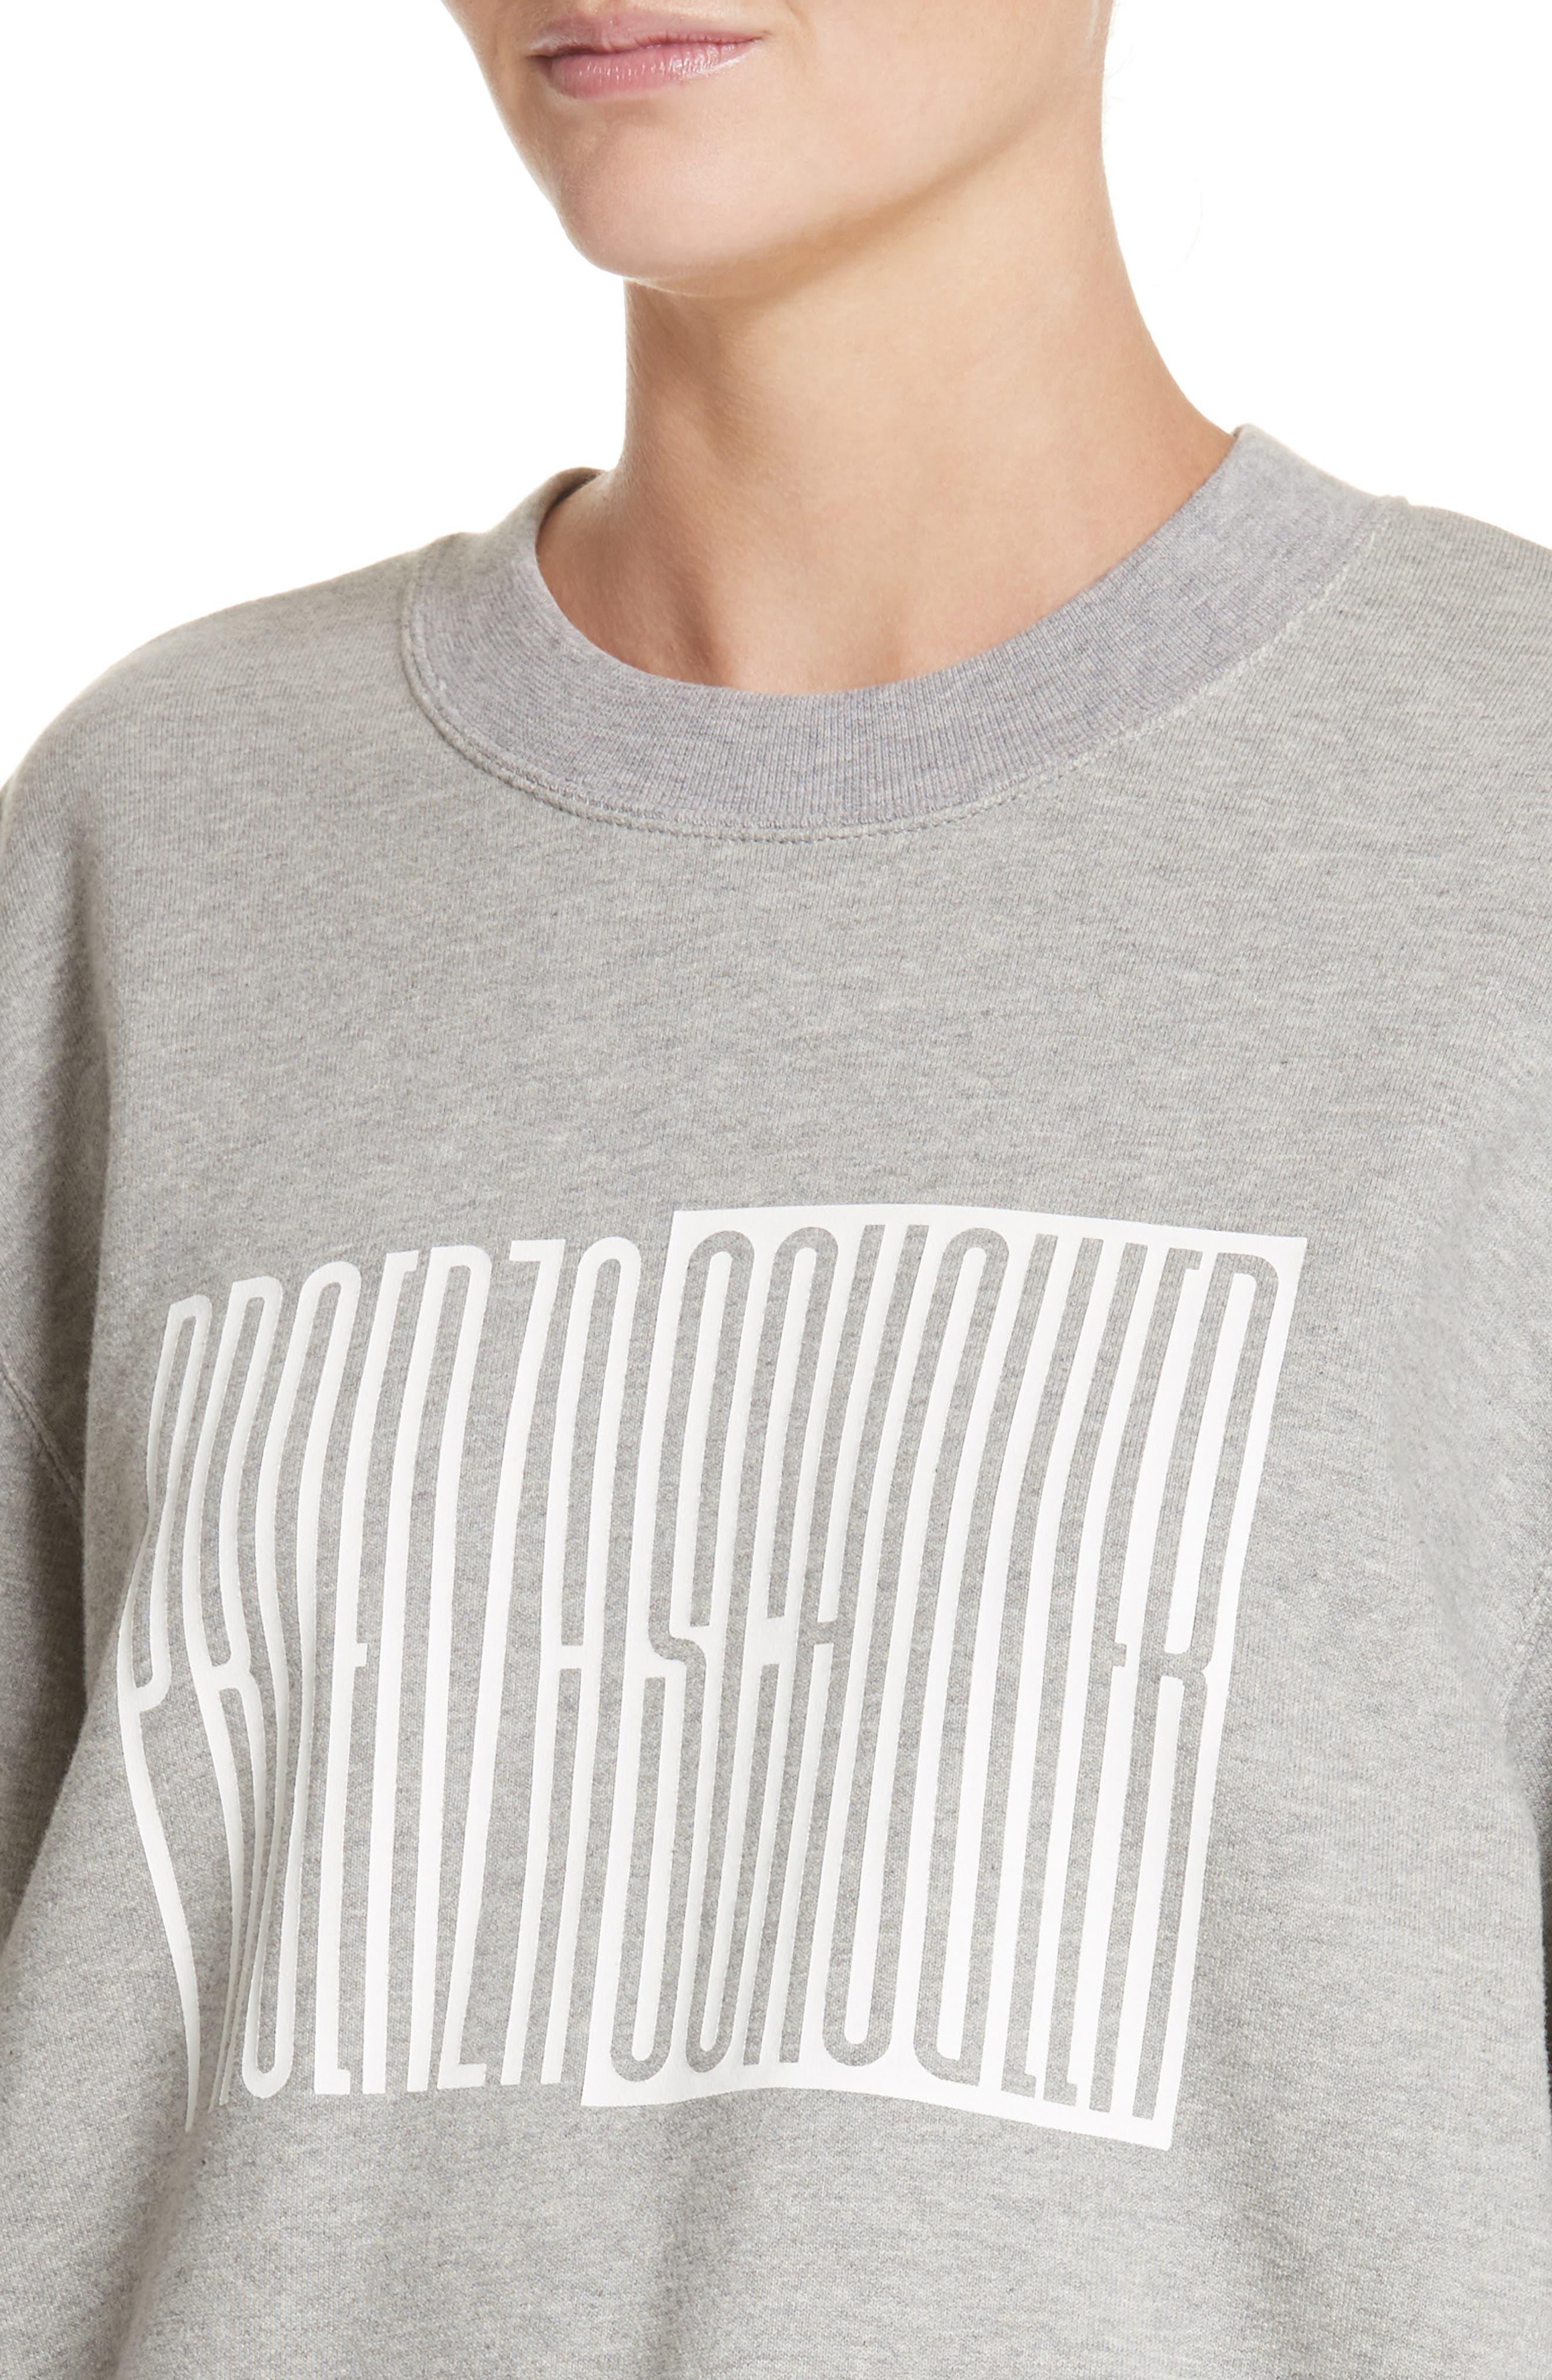 PSWL Graphic Jersey Oversize Sweatshirt,                             Alternate thumbnail 5, color,                             082